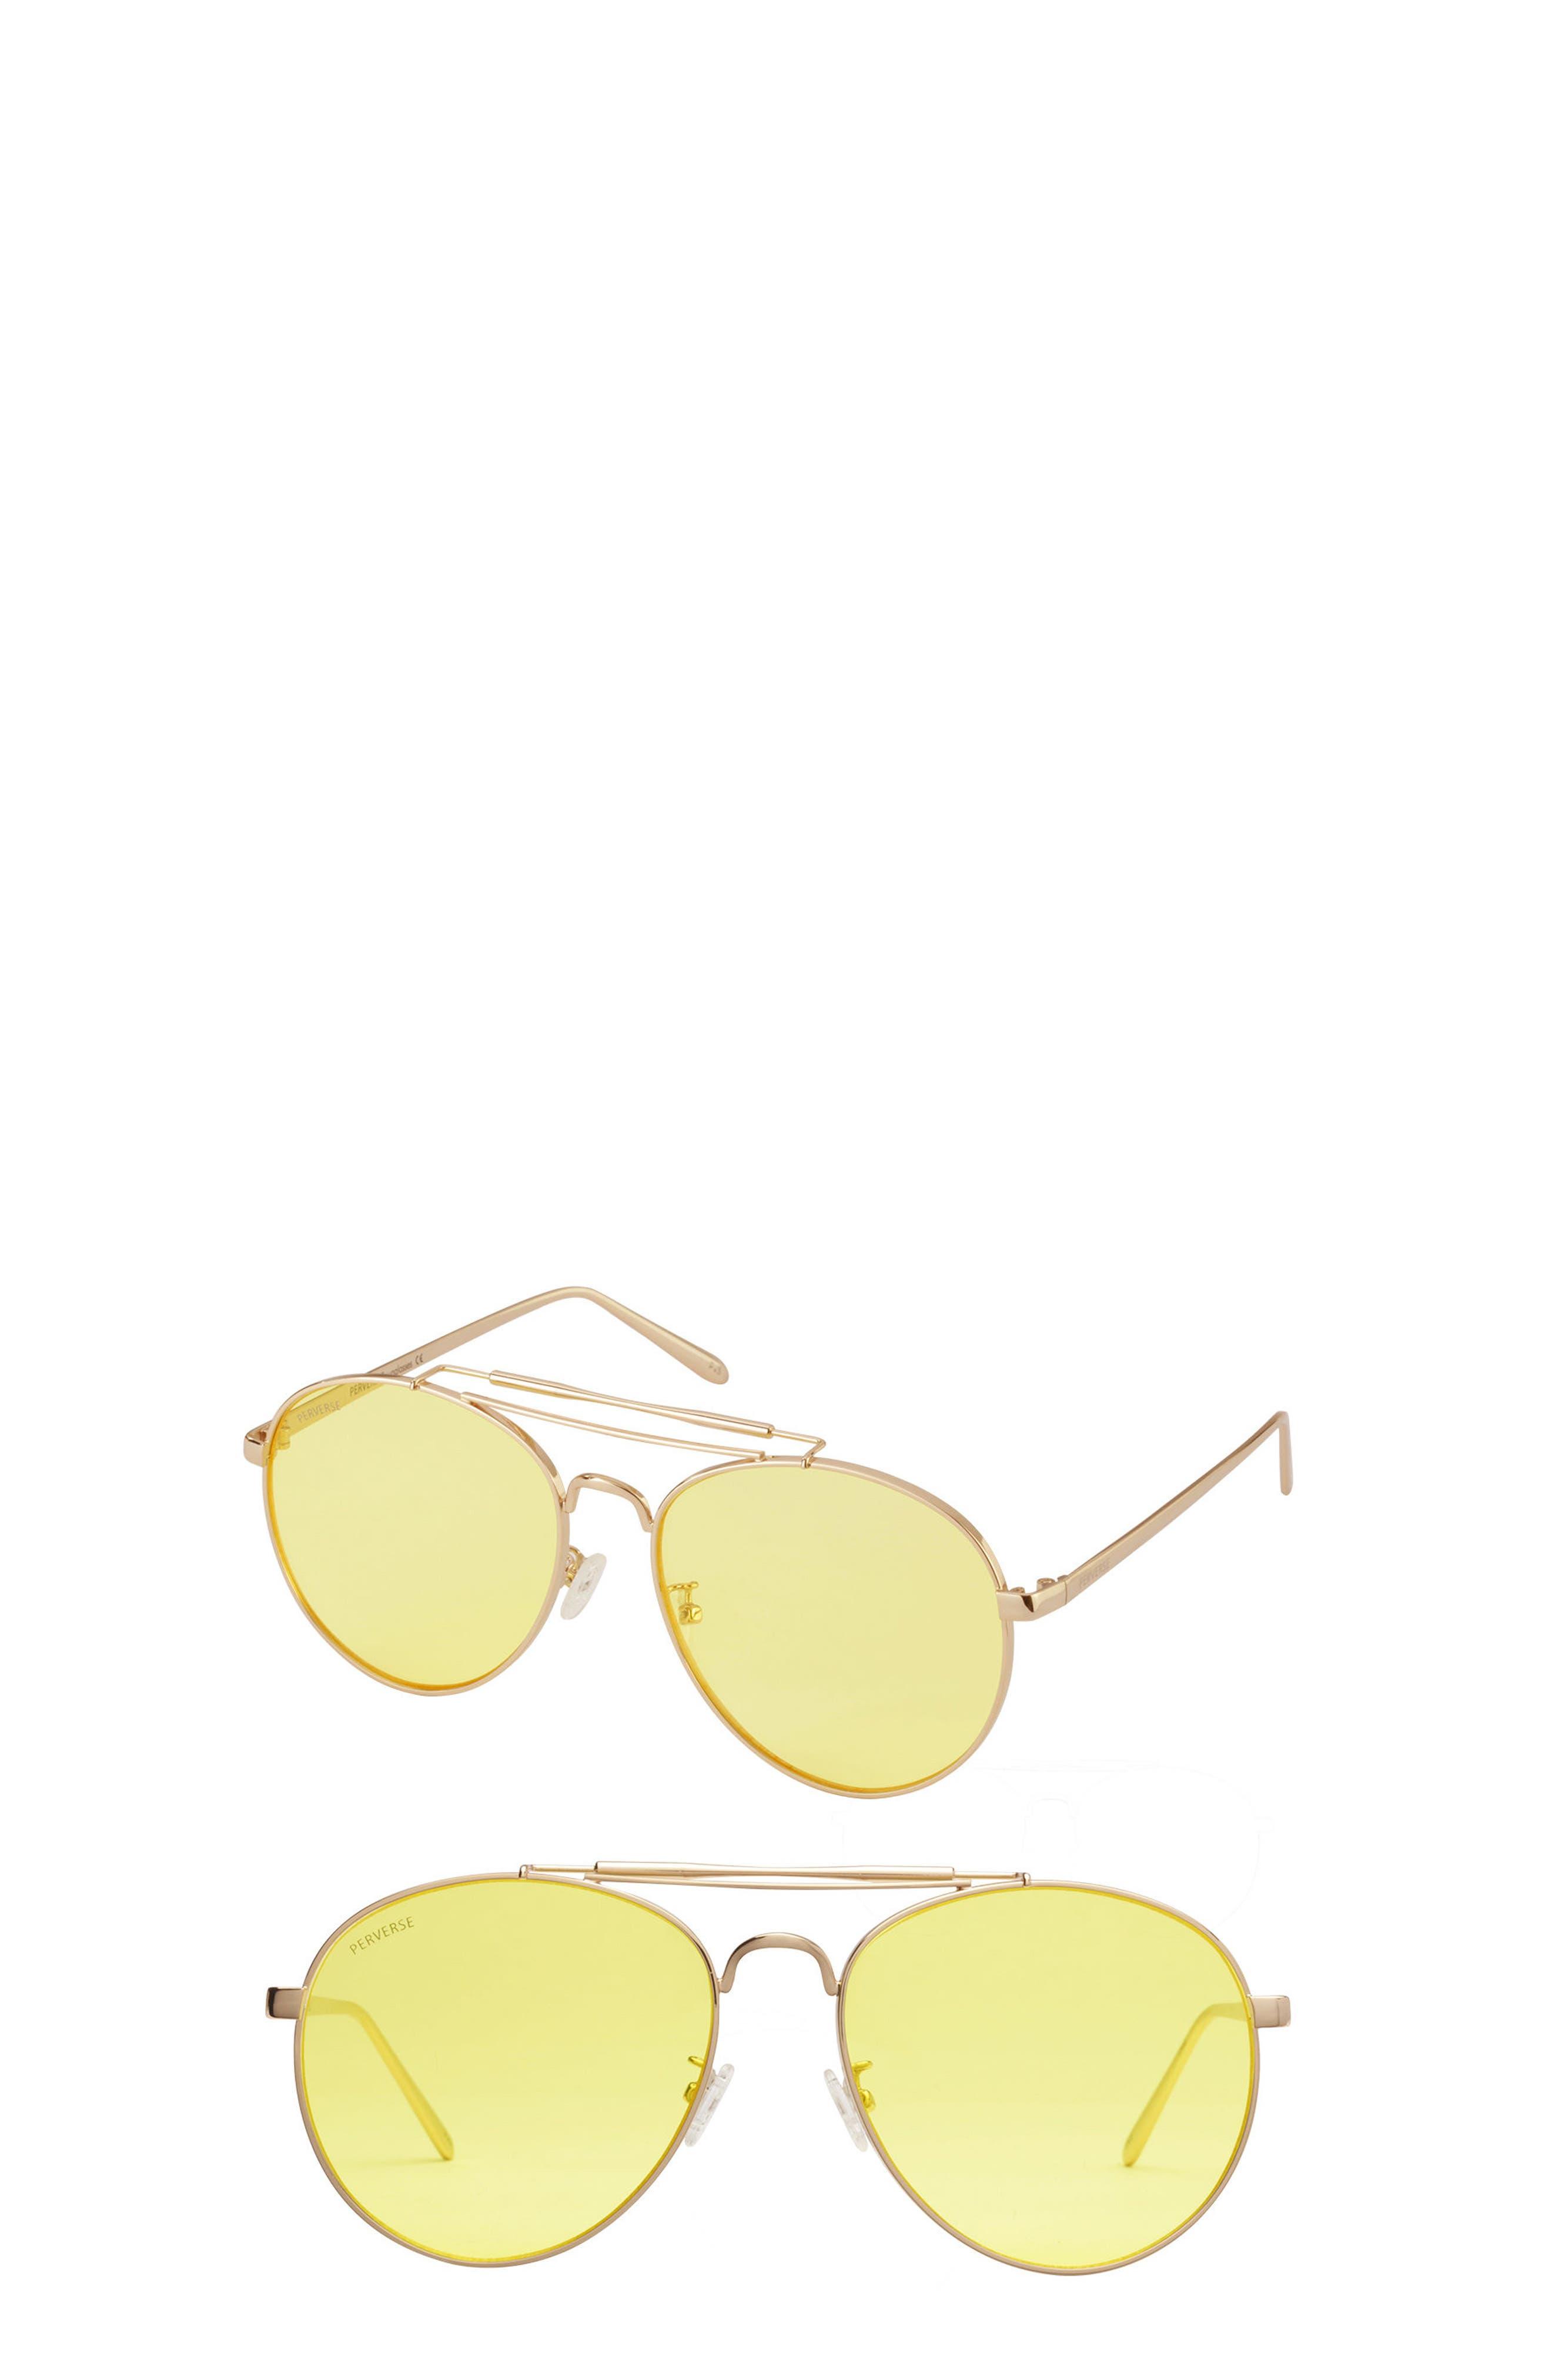 Main Image - PERVERSE Crisp Aviator Sunglasses